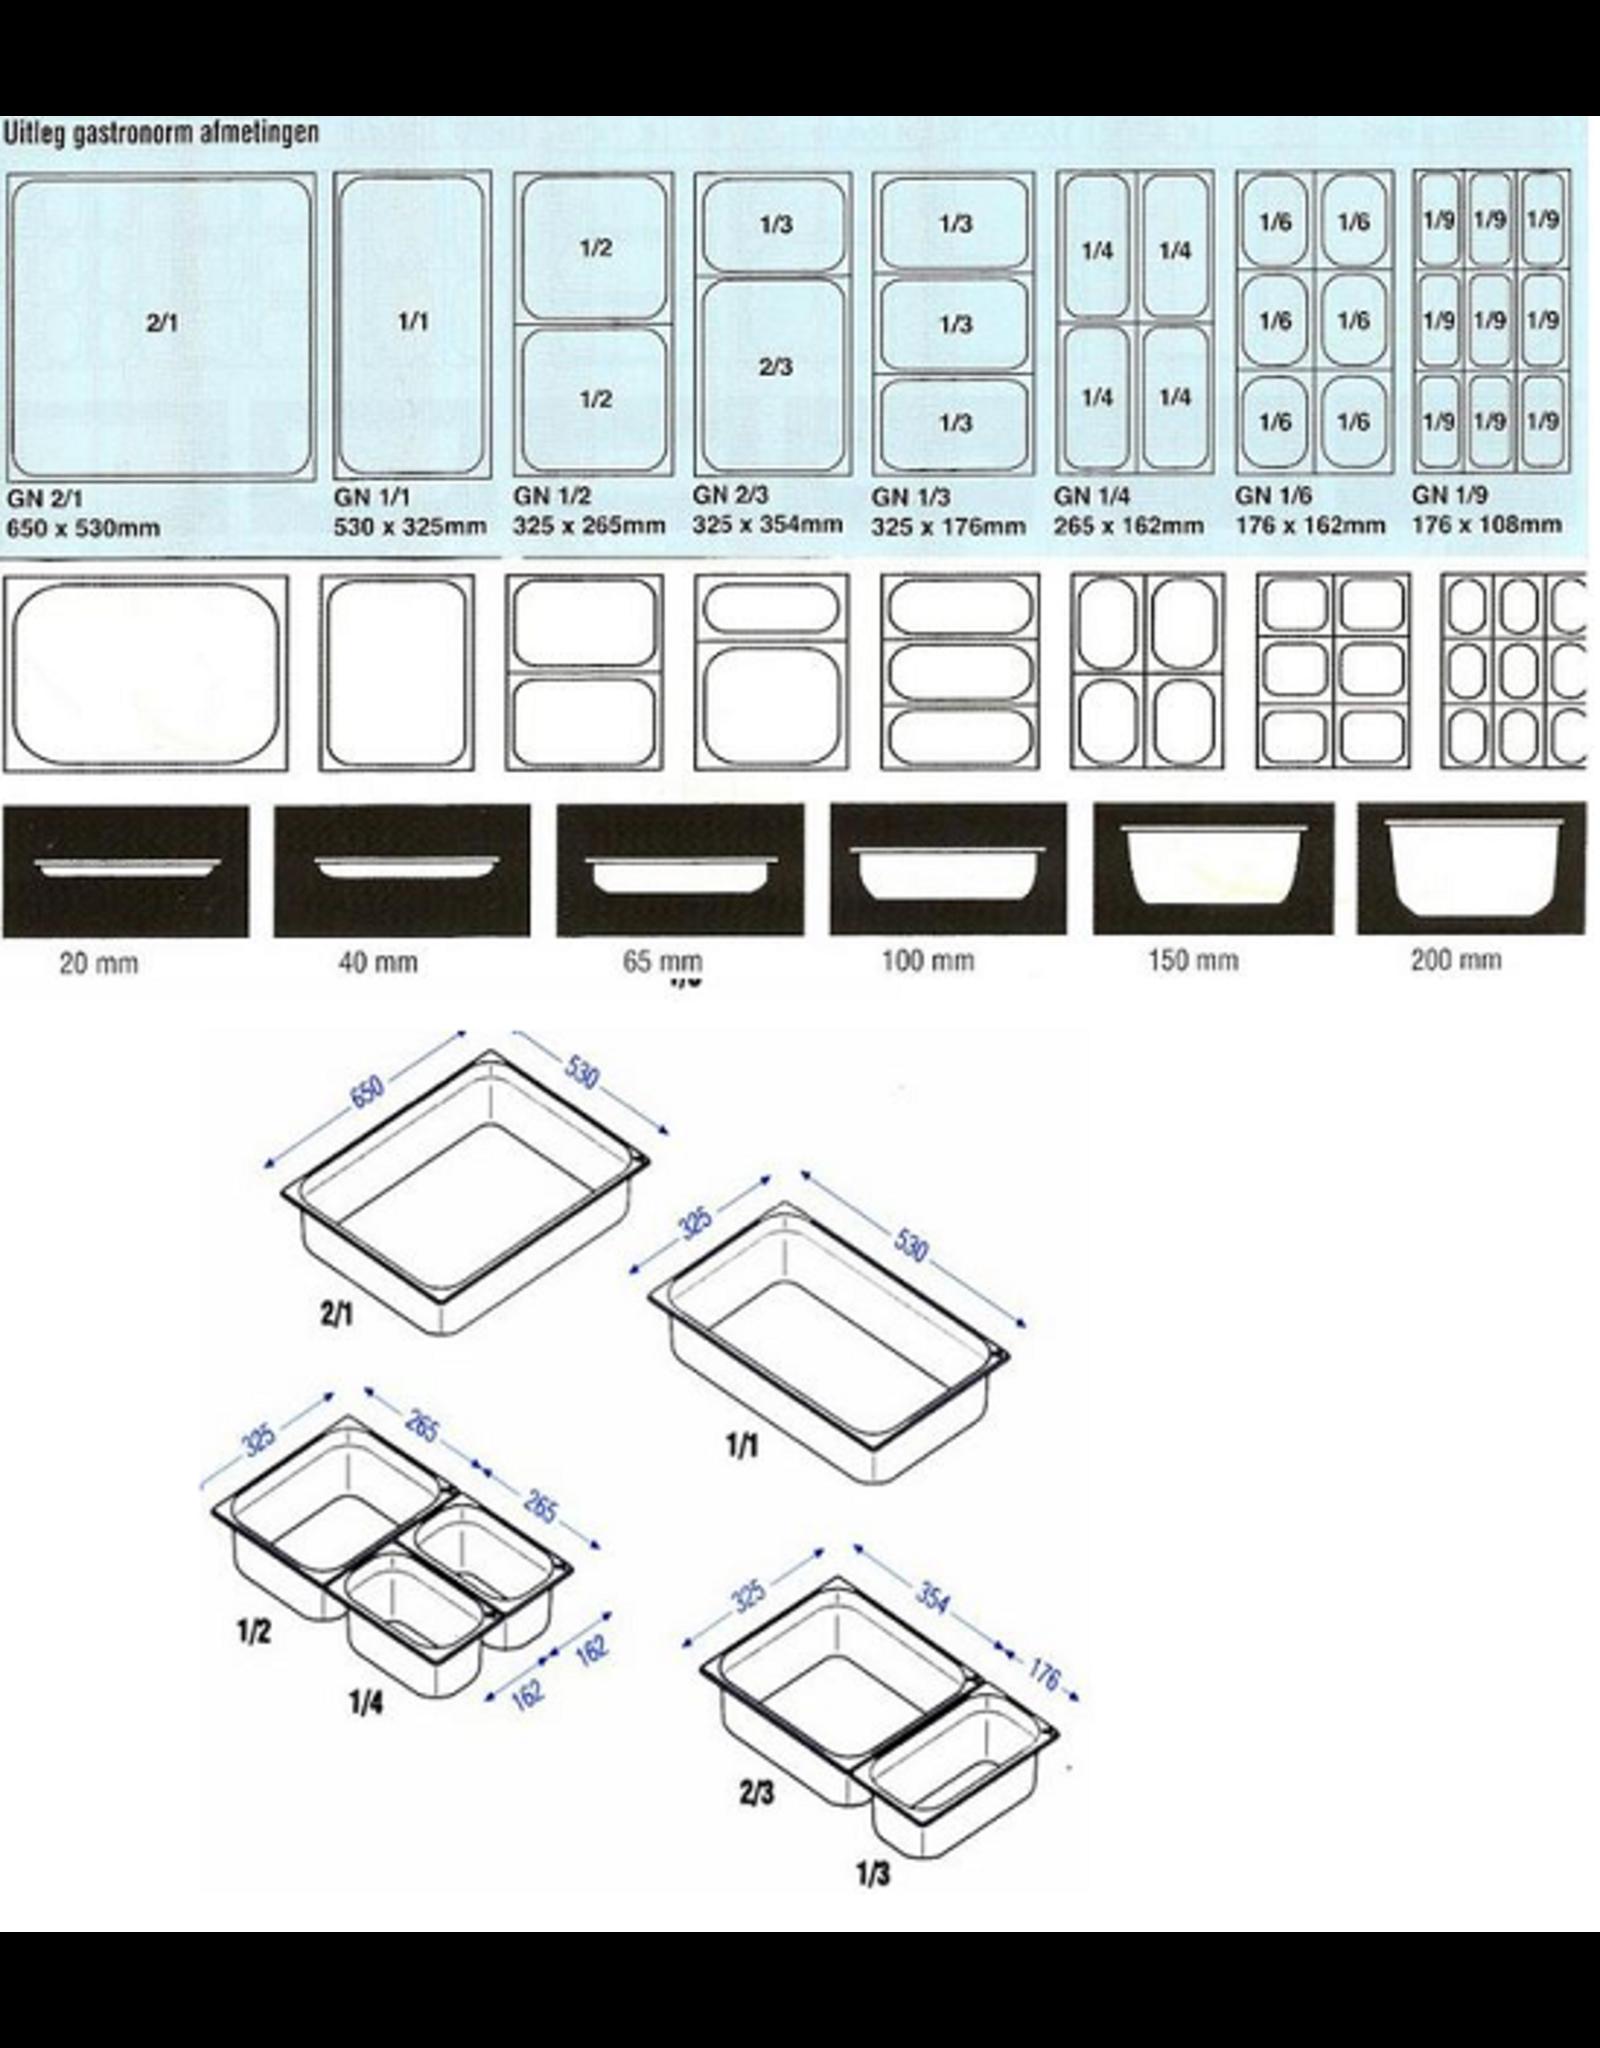 Q-Gastro Gastronorm Bak RVS 1/1GN | 100mm | 530x325mm